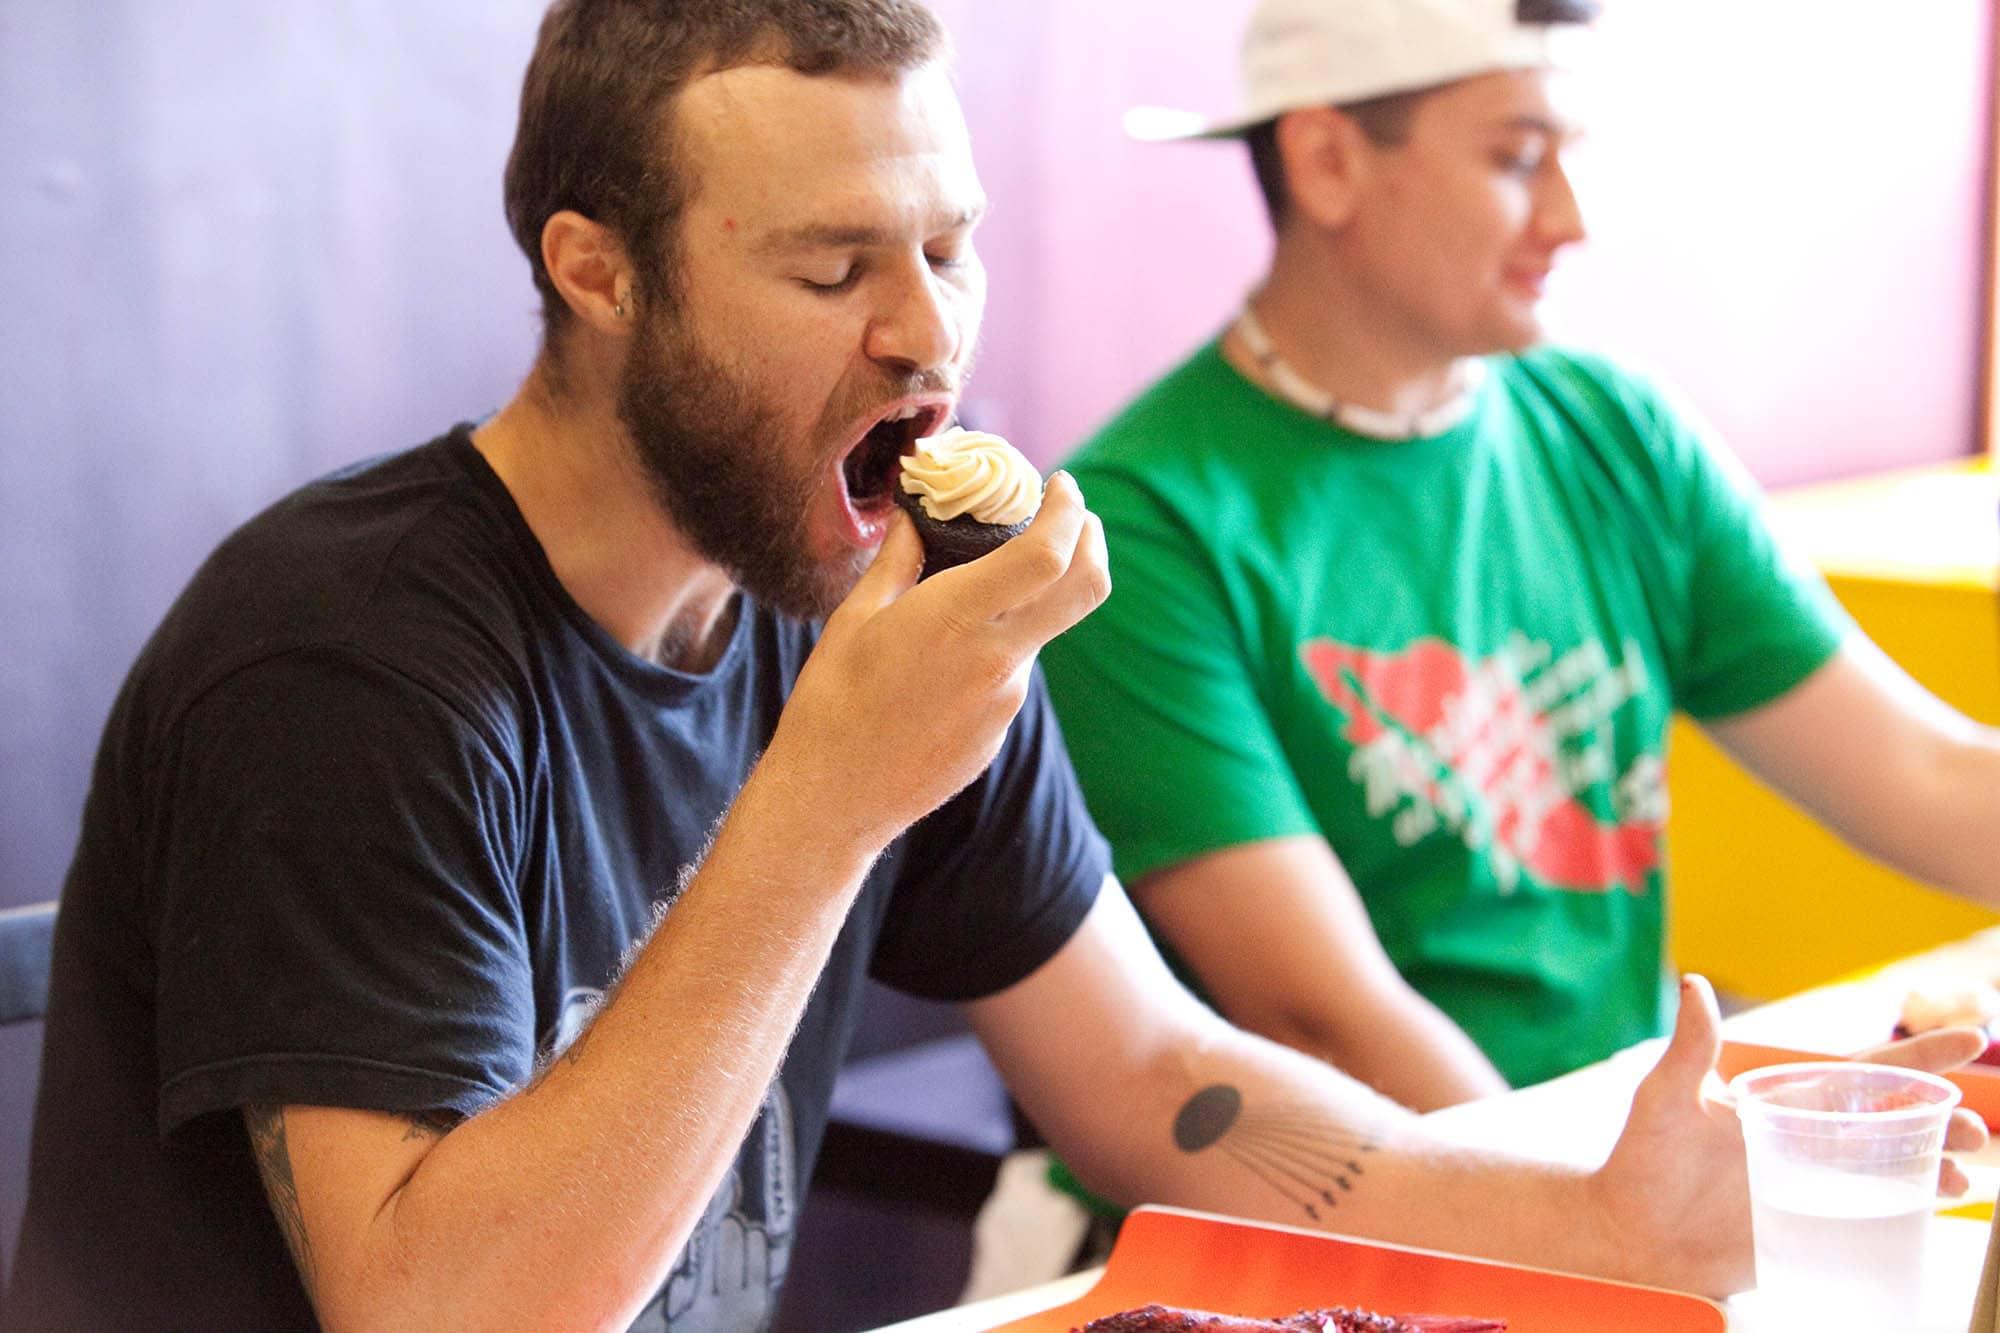 Vegan cupcake eating Contest